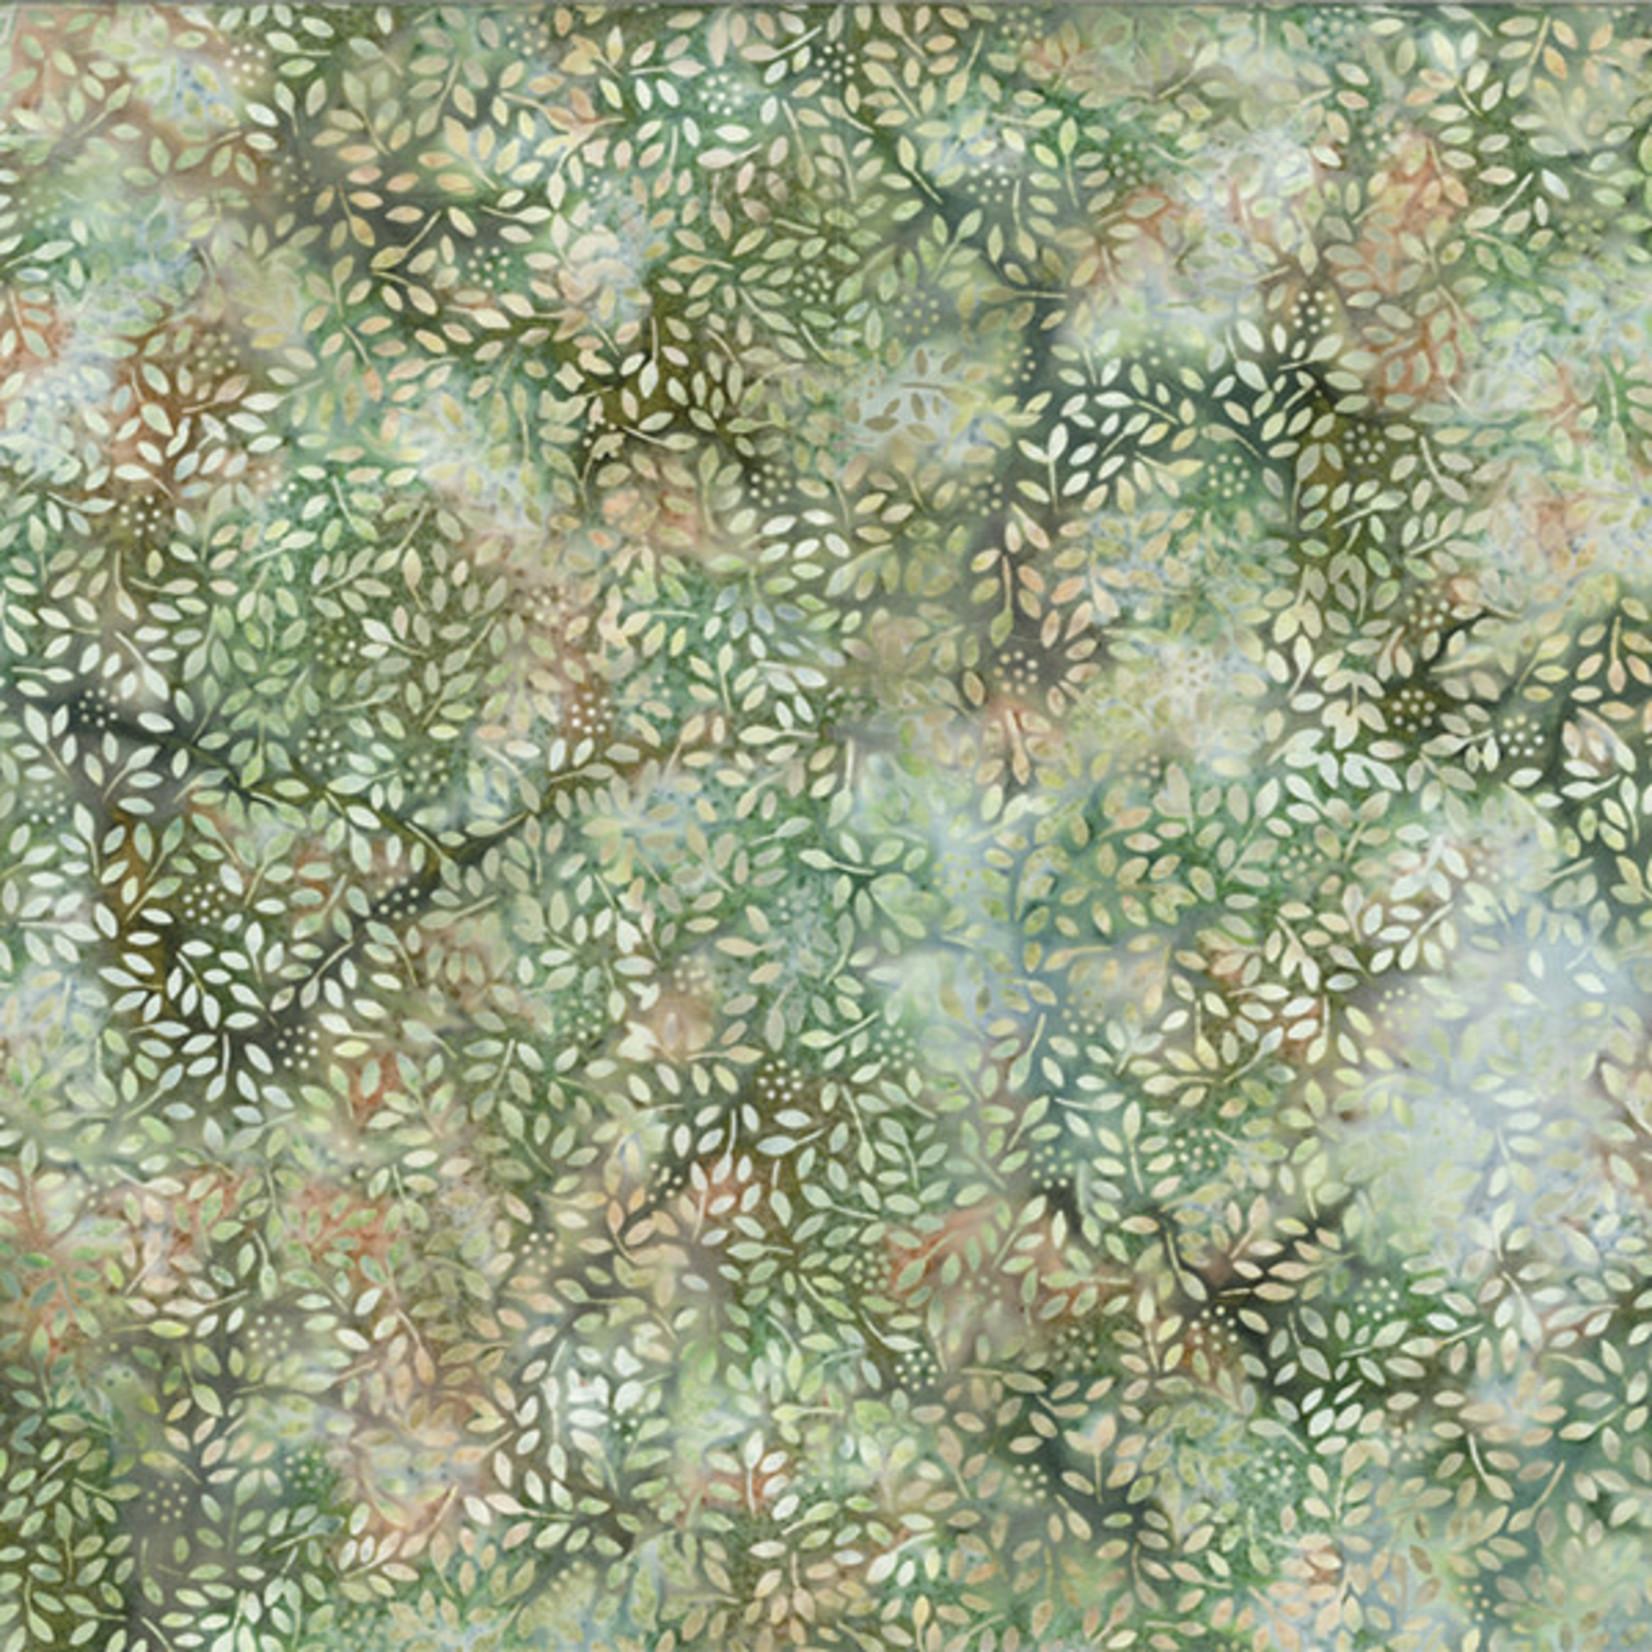 Hoffman Fabrics Bali Batik Leaves and Dots 2319 - Spring